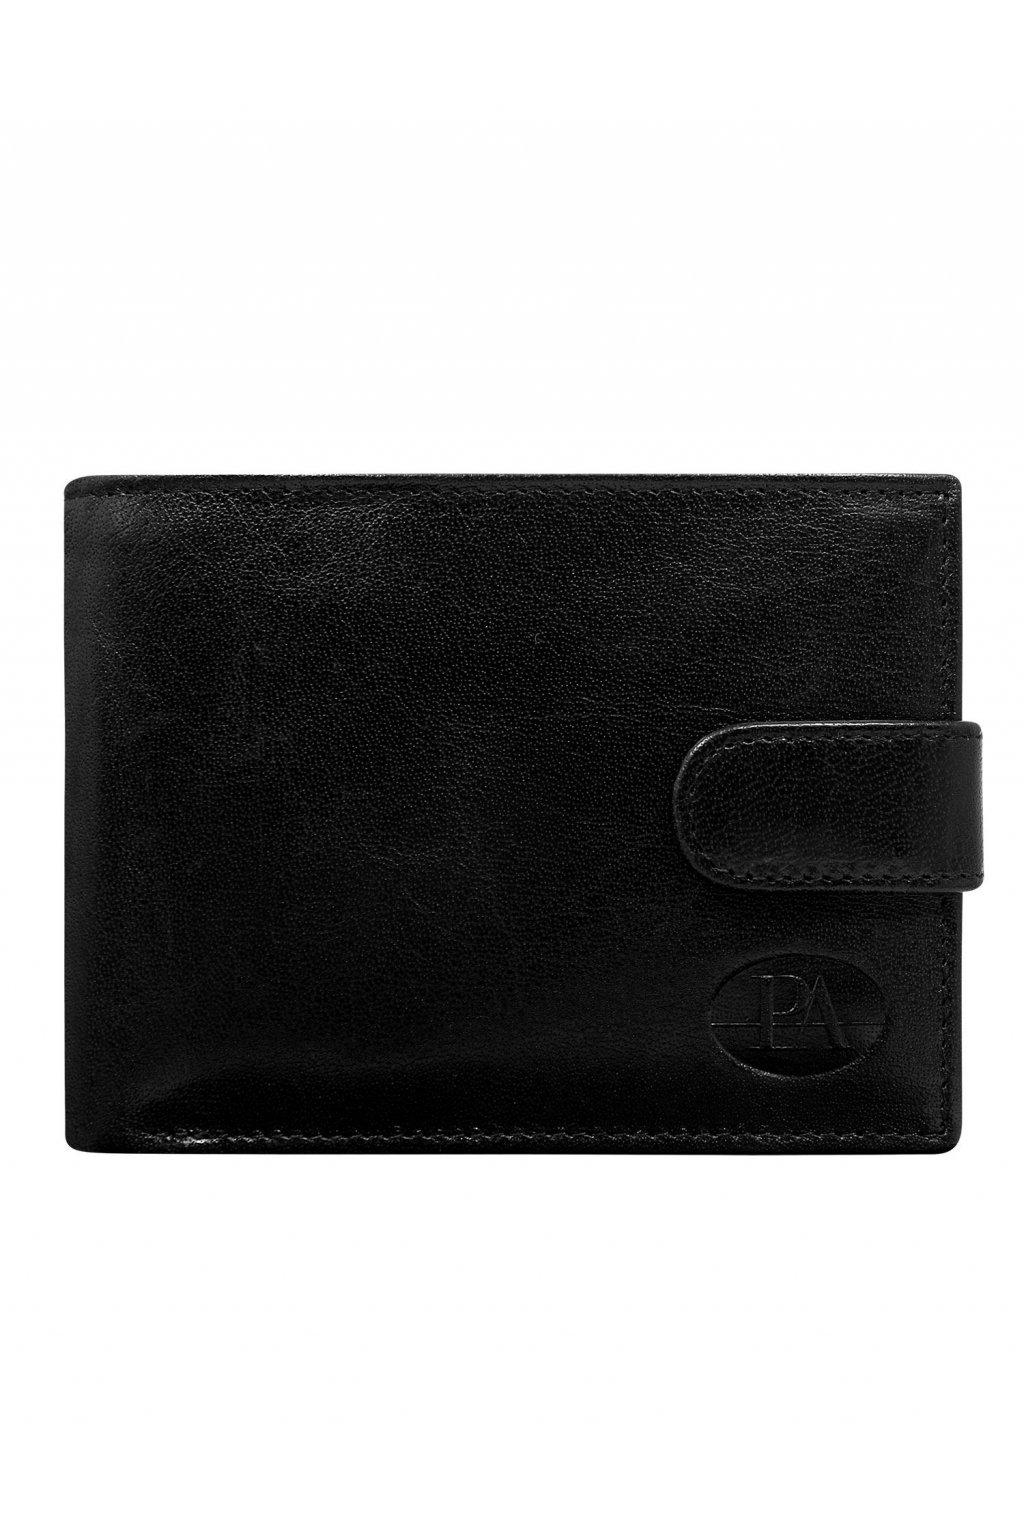 Pánska peňaženka kód CE-PR-PW-008L-BTU.35